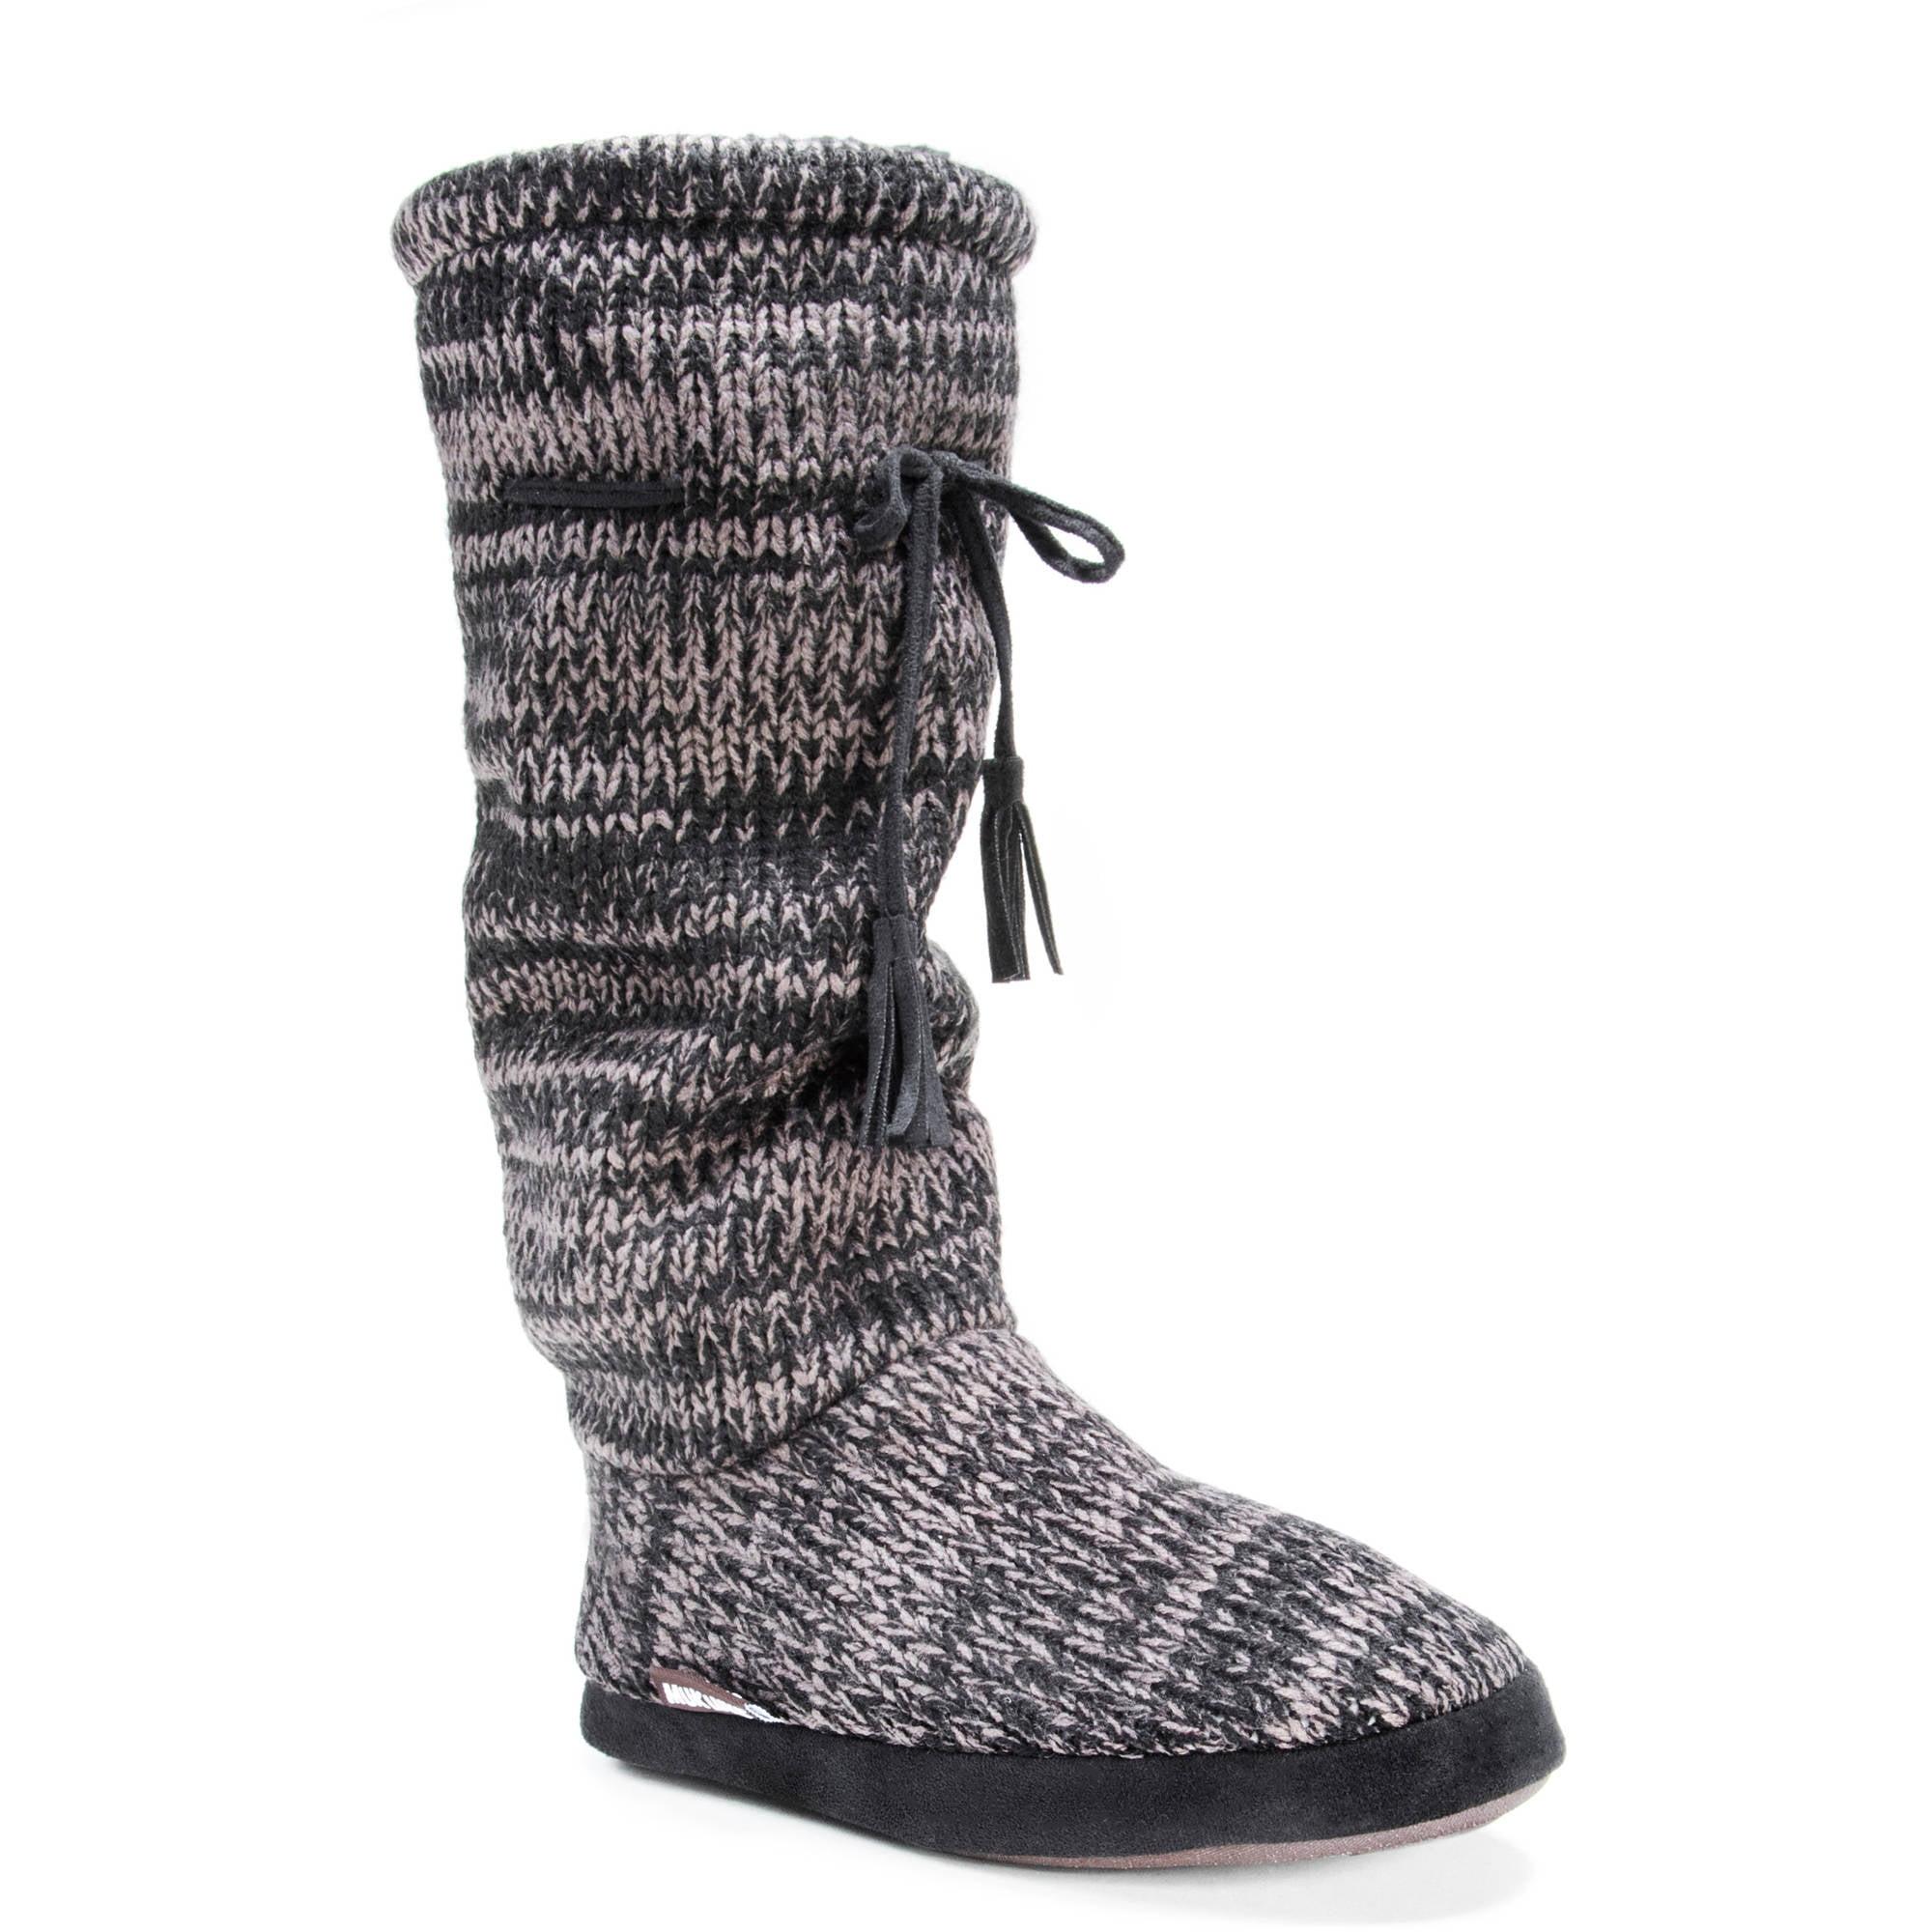 6ef16d23fb9 Demonia - Women s Kera 21 Ankle Boot - Walmart.com